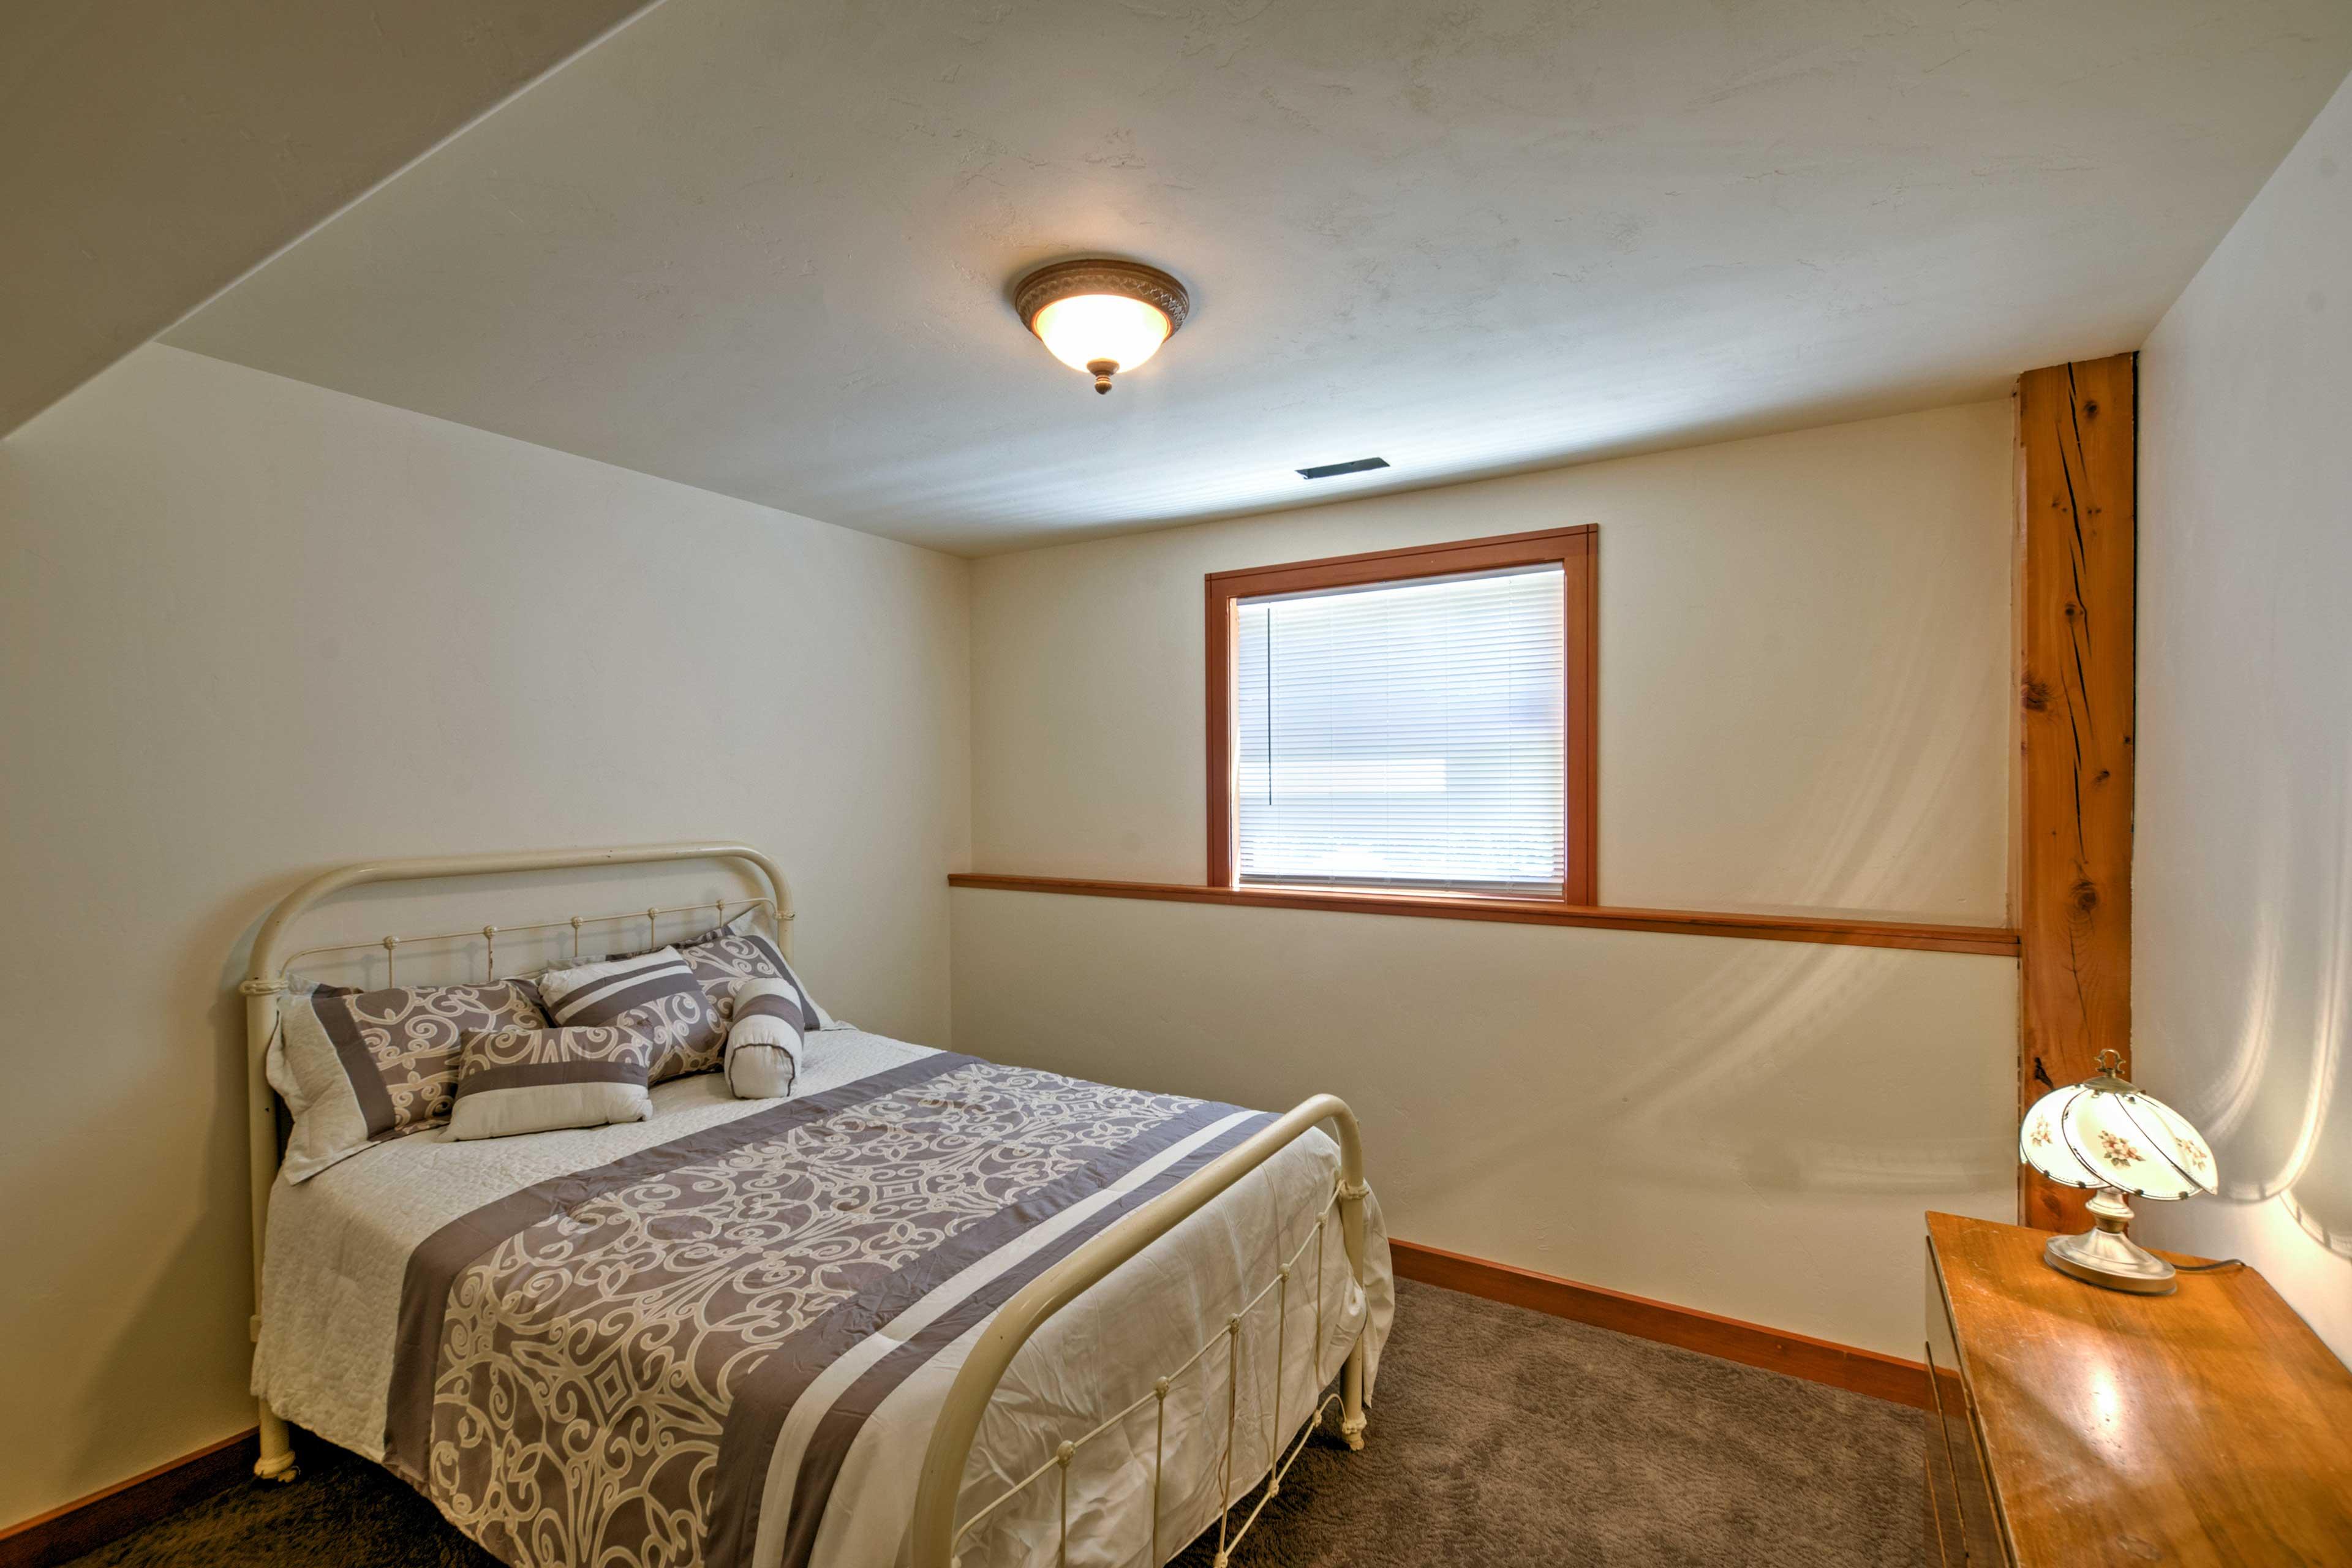 This cozy bedroom sleeps 2.